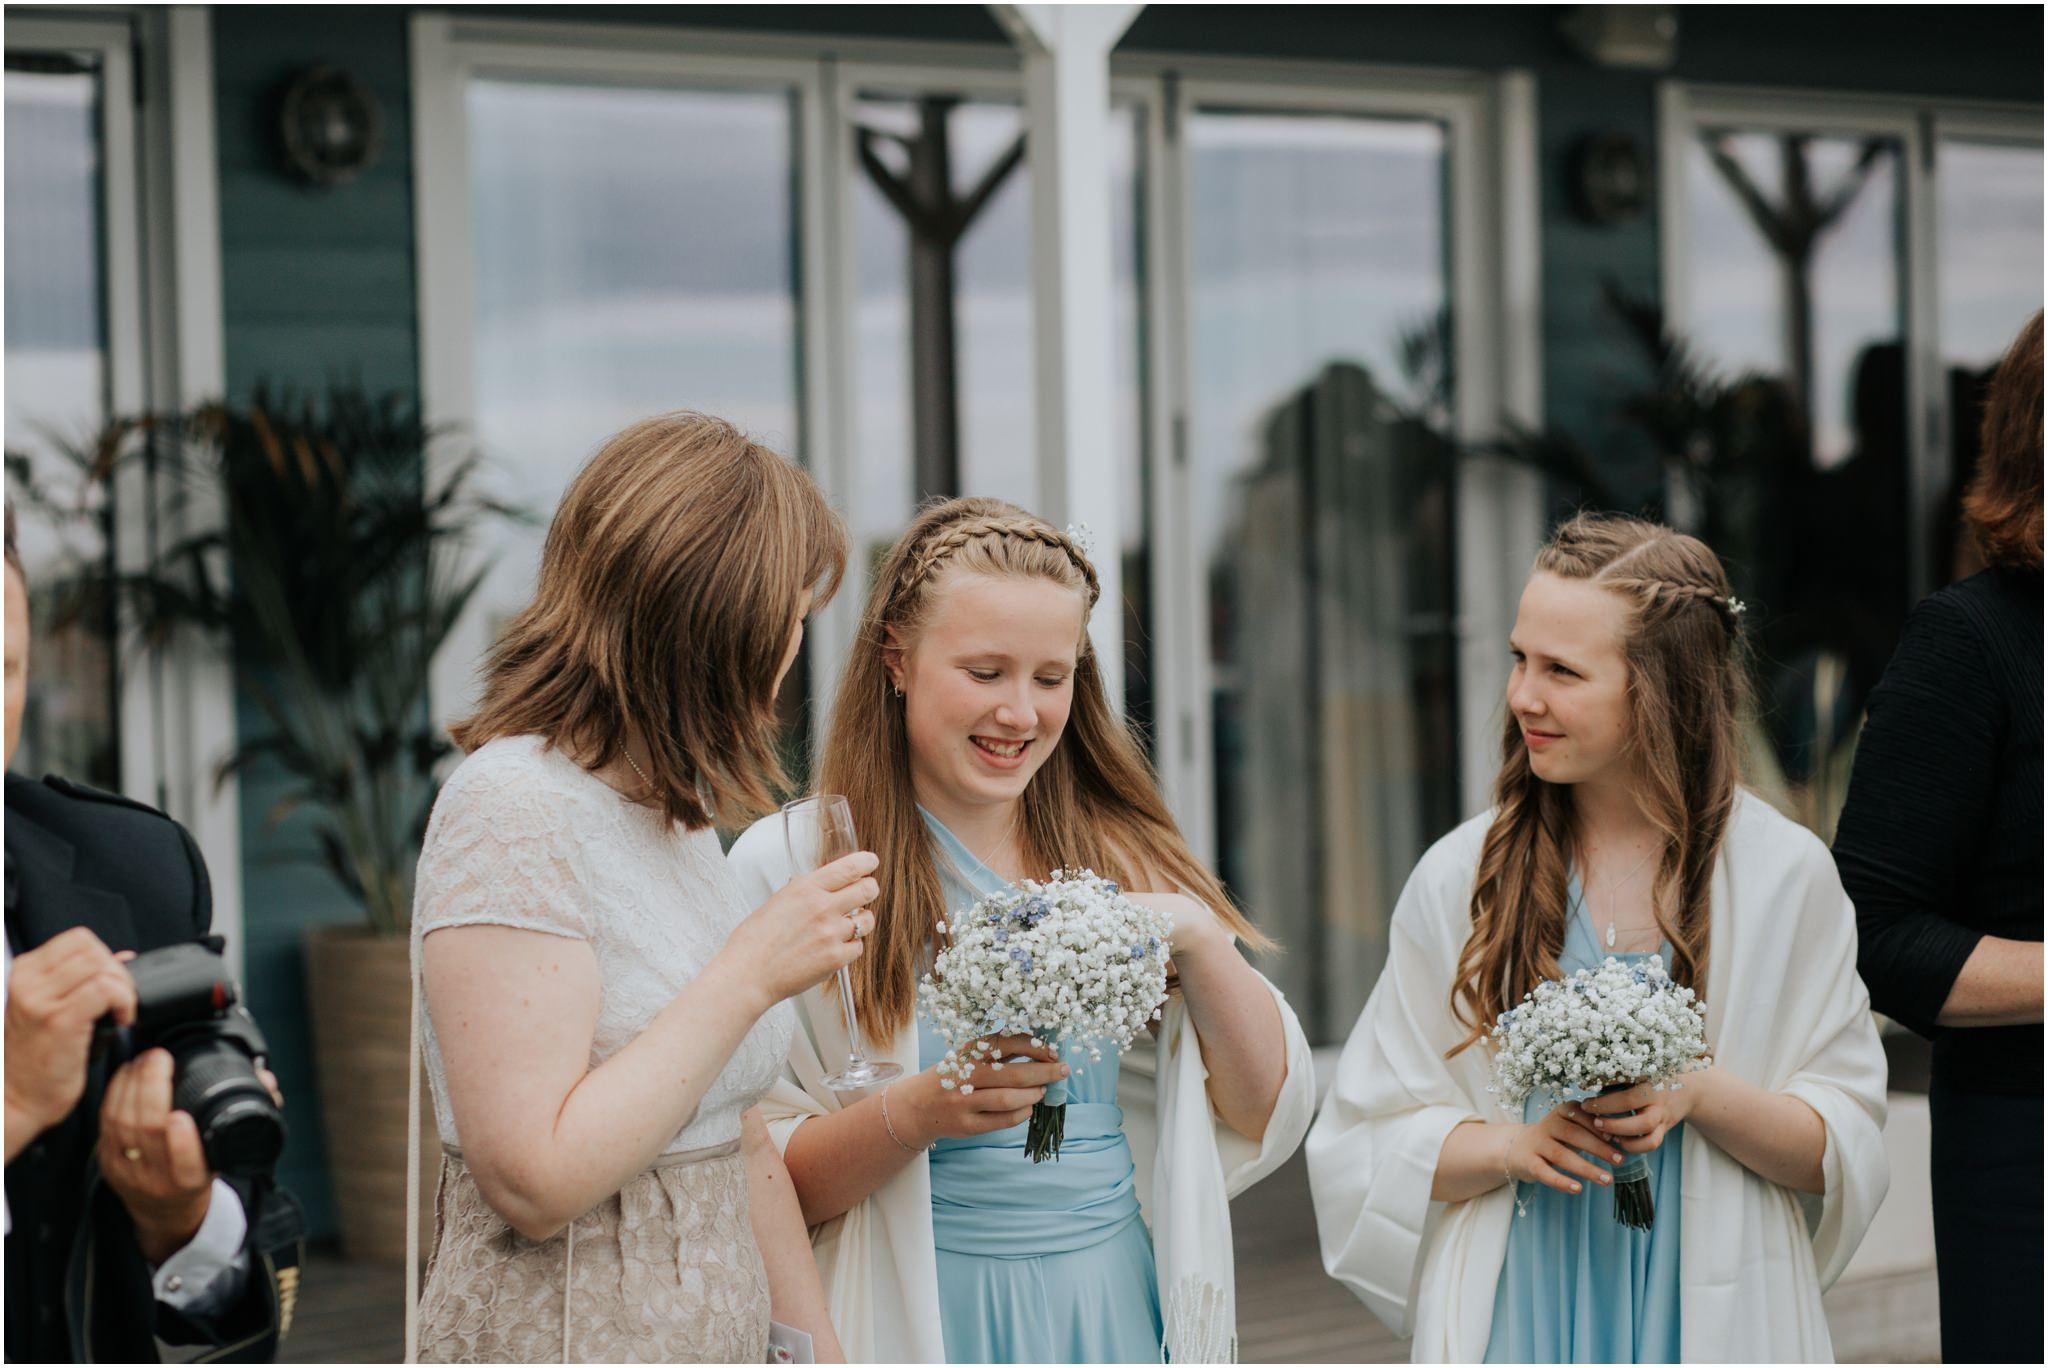 Photography 78 - Glasgow Wedding Photographer - Jordan & Abi - The Waterside Hotel, West Kilbride_0090.jpg